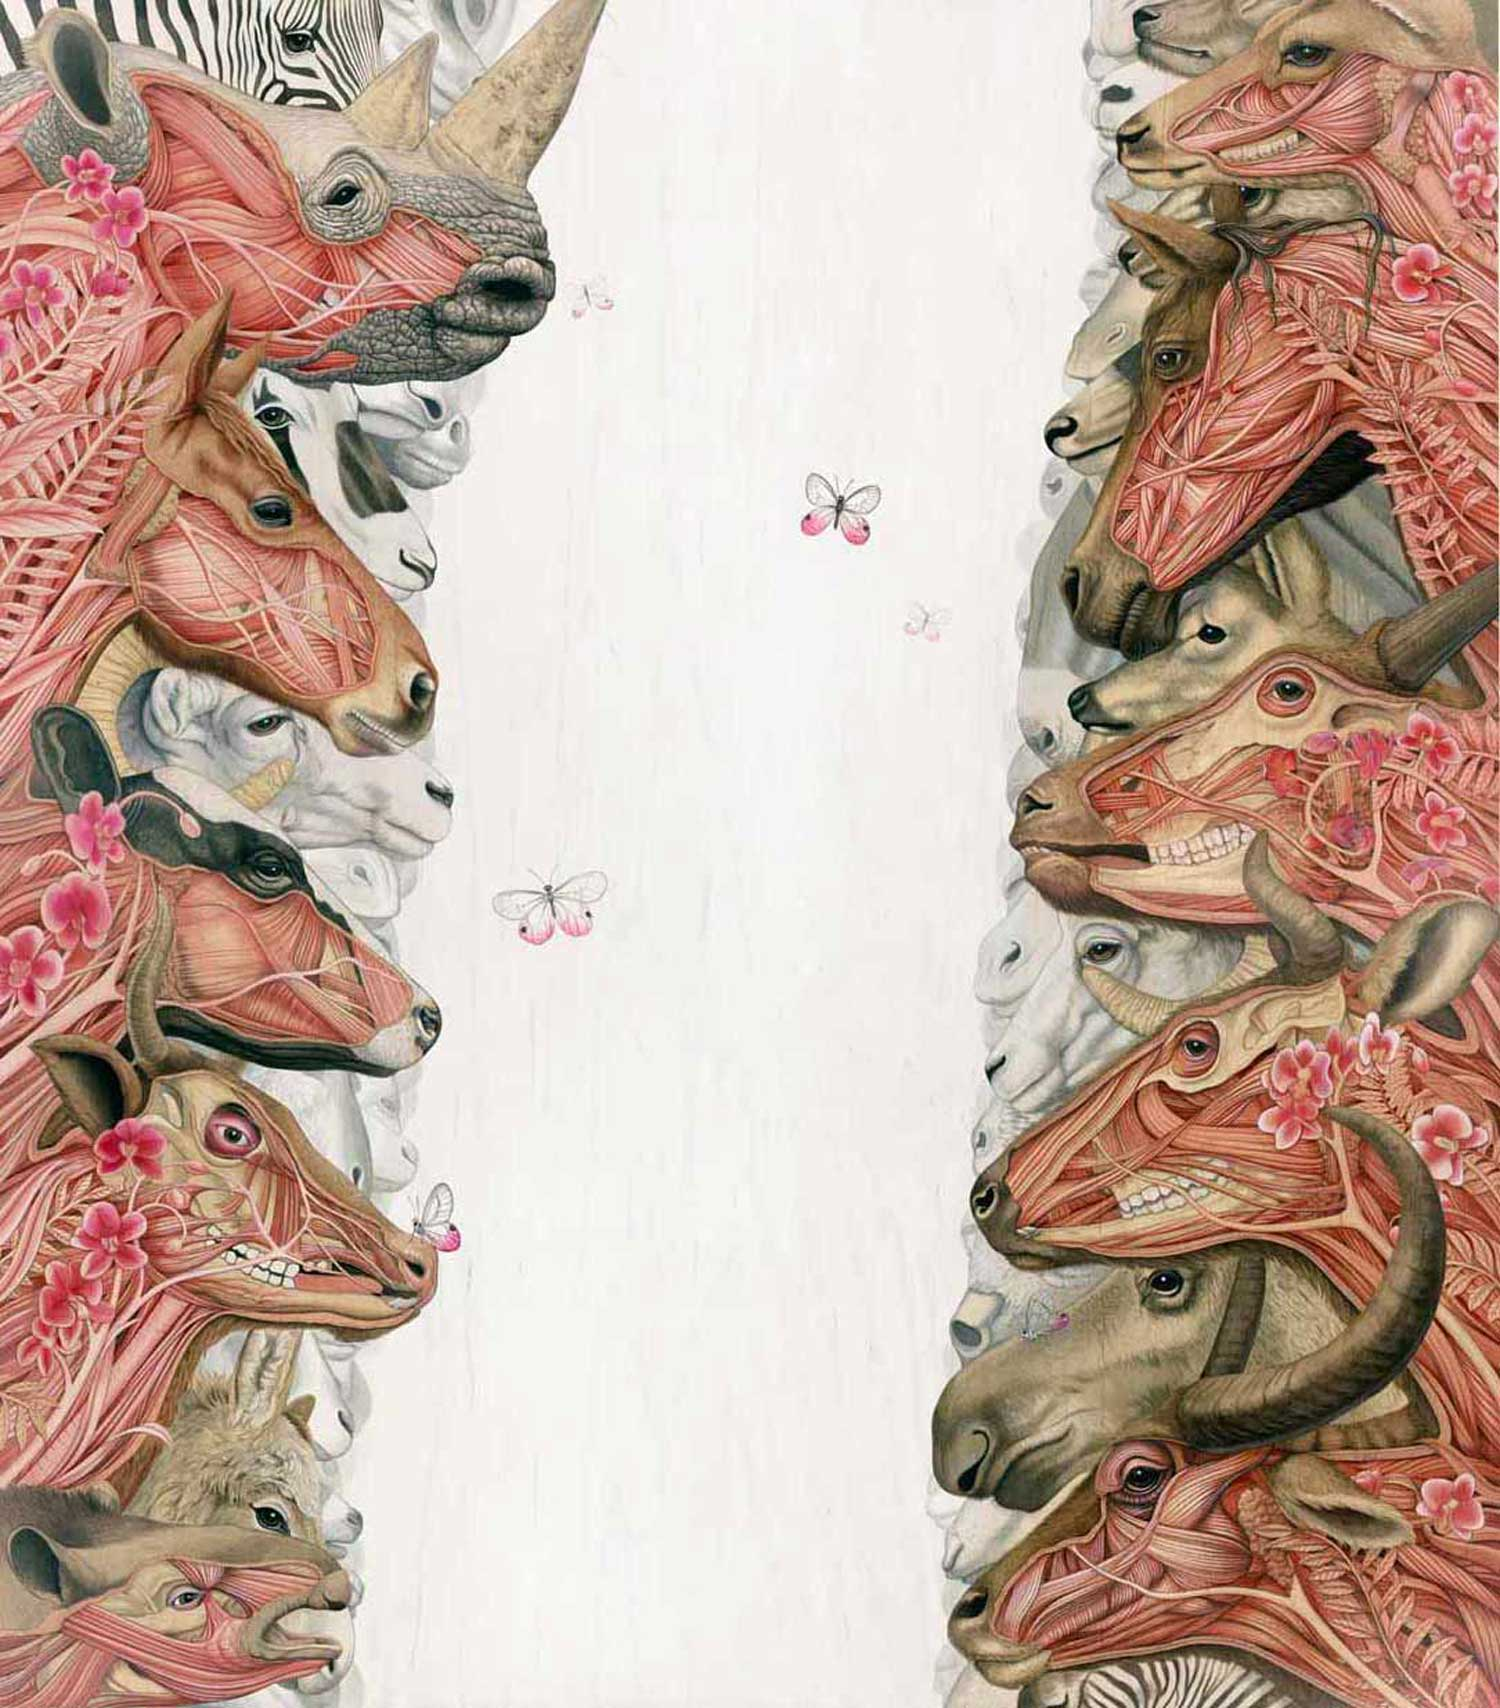 tiffany bozic surreal animals rhino anatomy